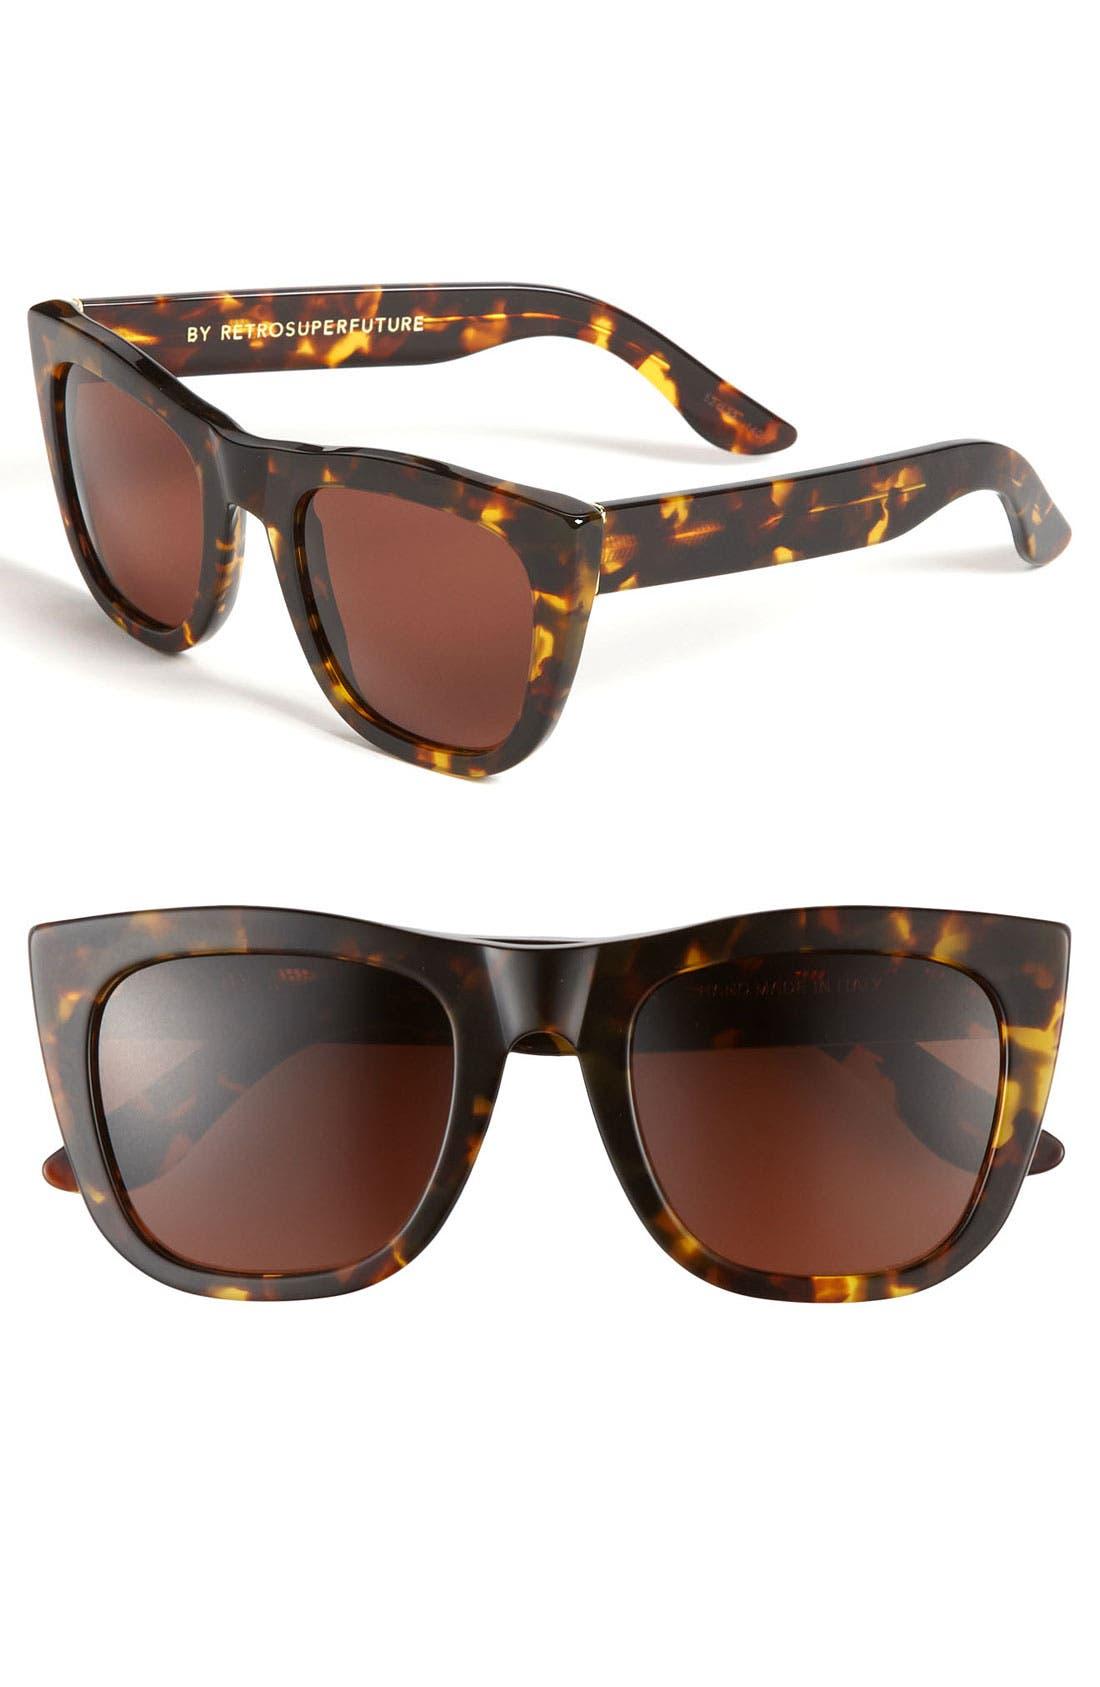 Main Image - SUPER by RETROSUPERFUTURE® 'Gals' Sunglasses